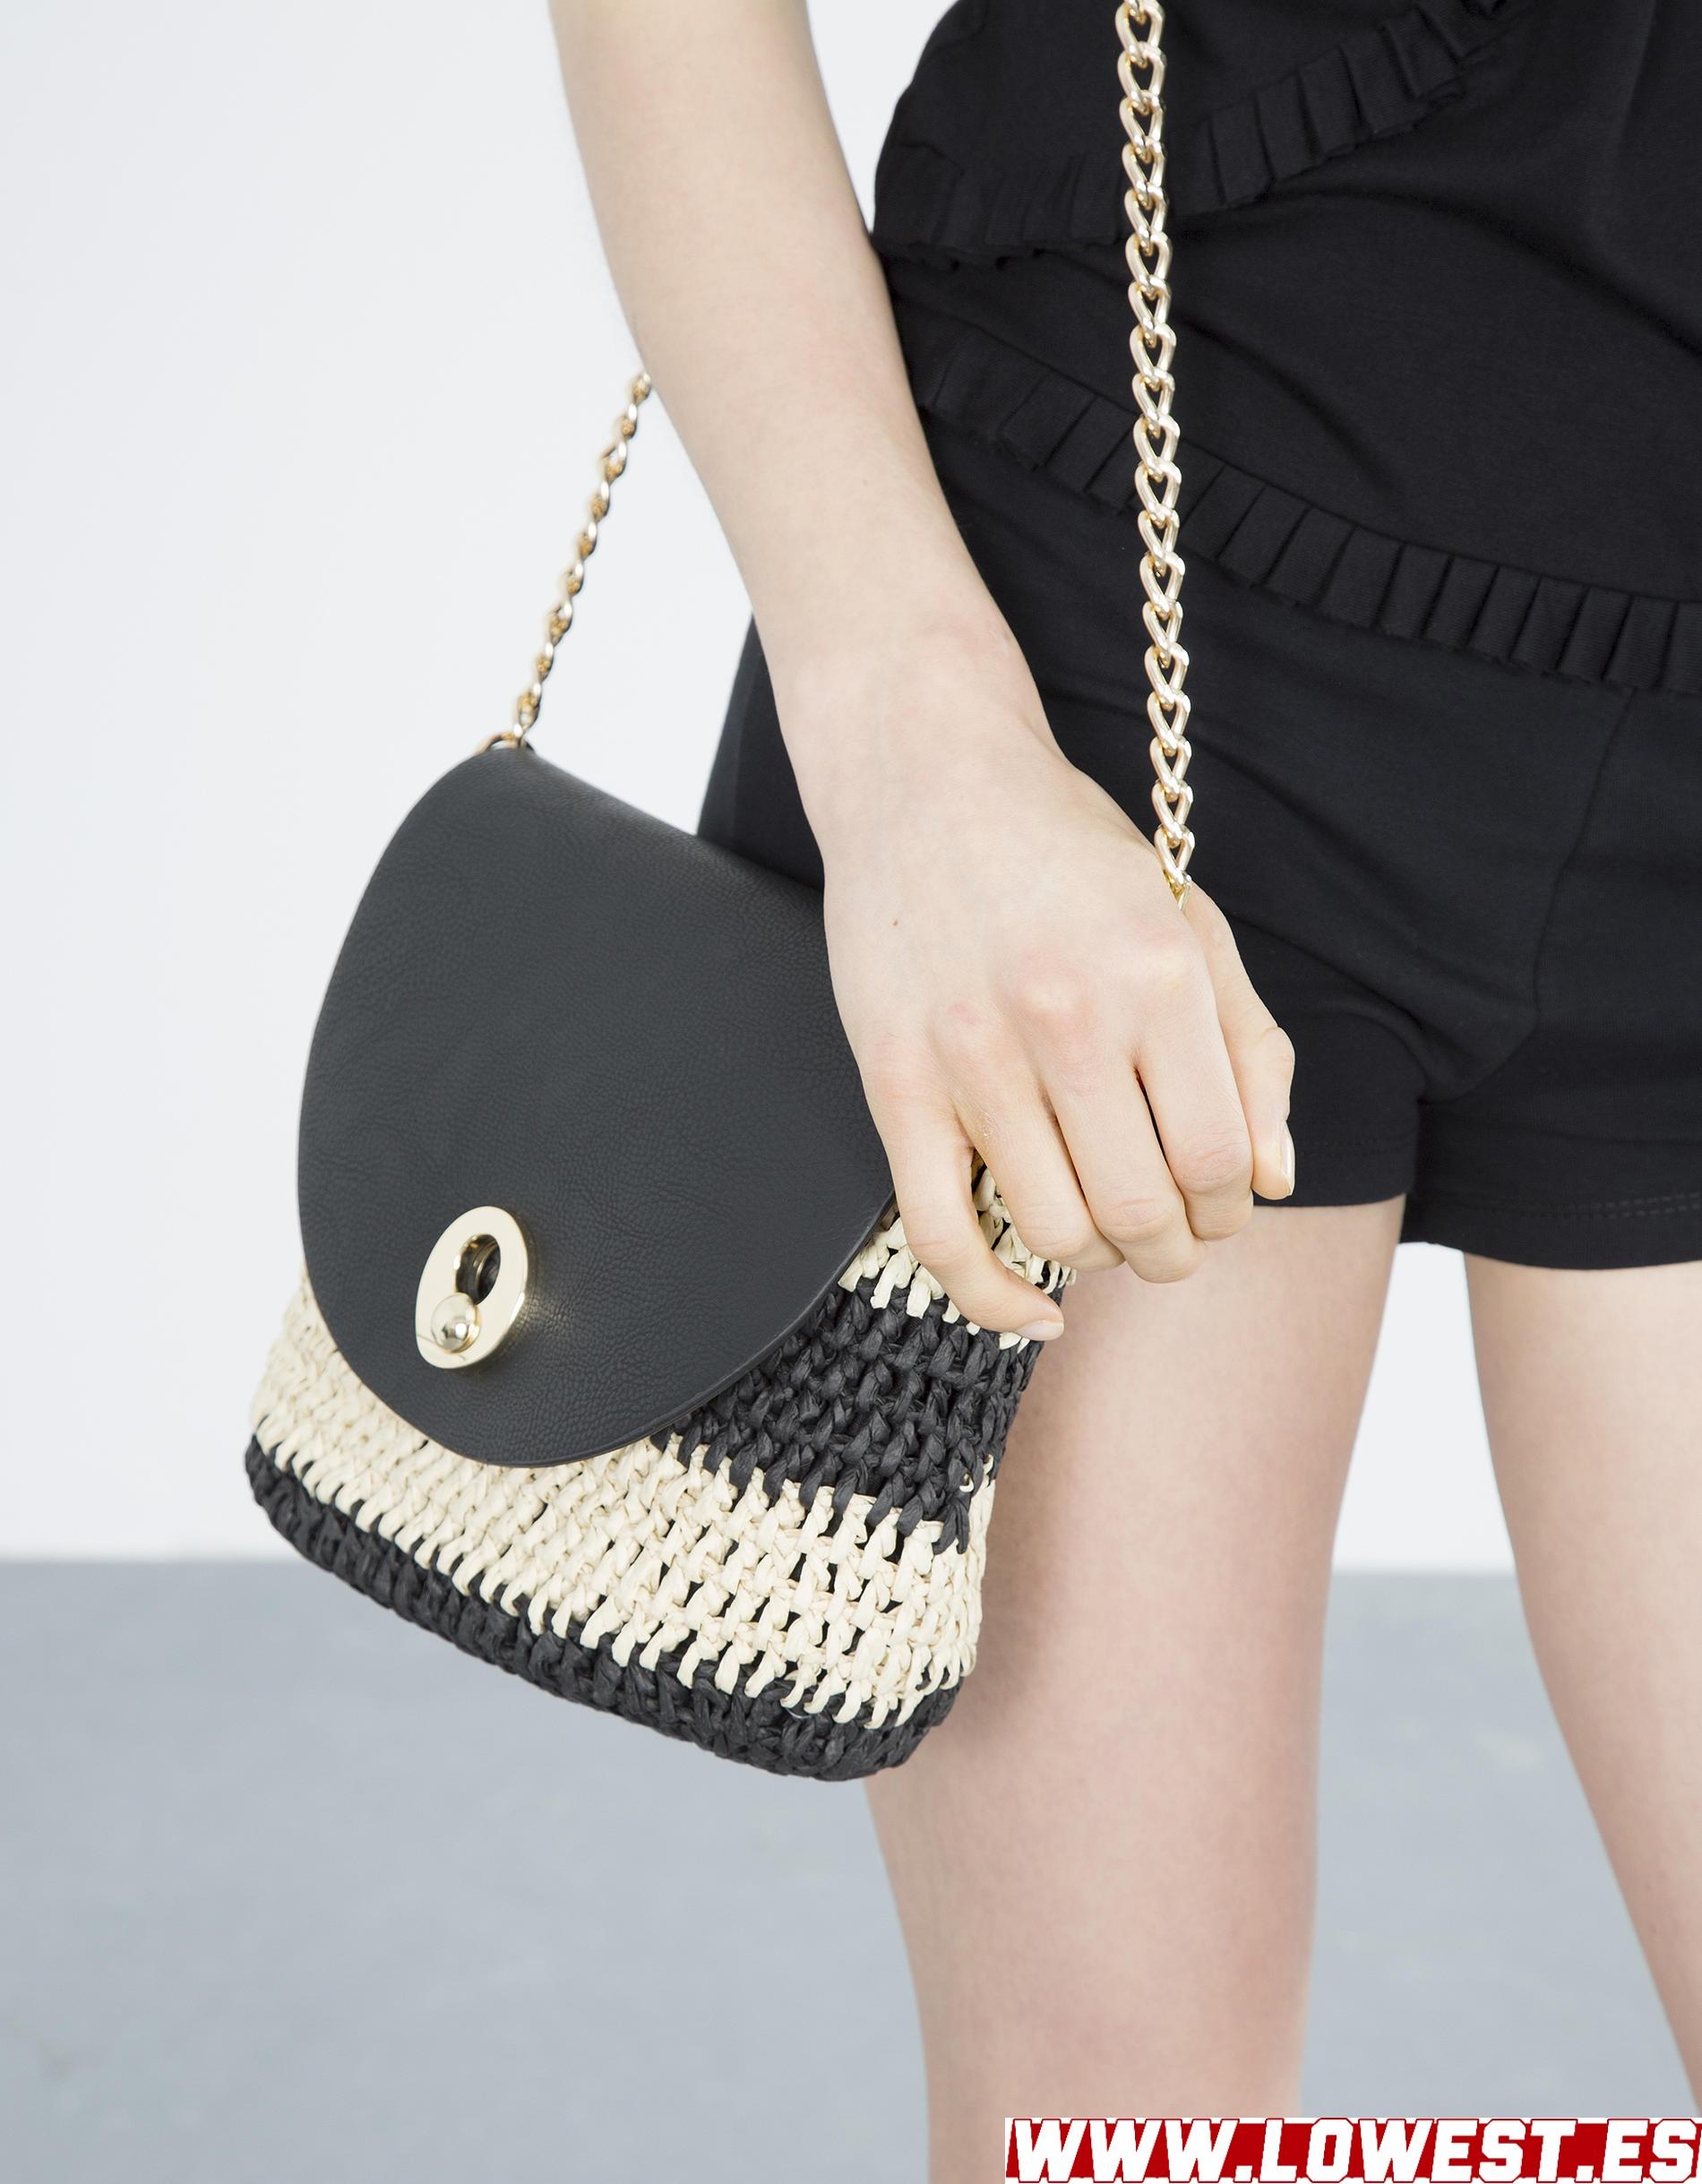 rebajas online ropa bloguera famosa estilosa 2019 2020